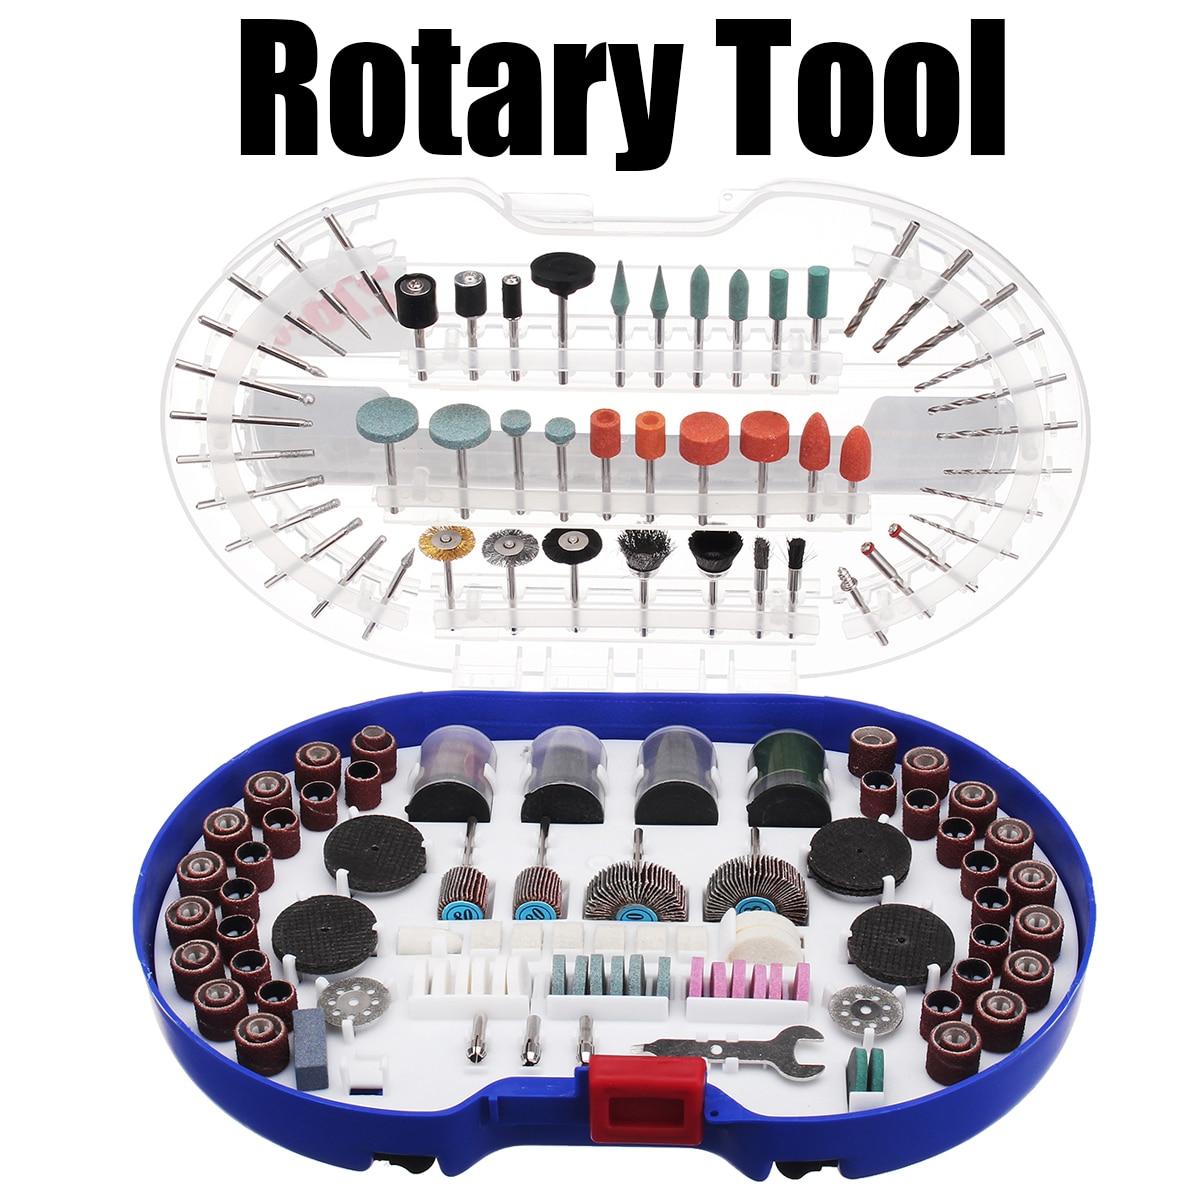 276PCS Rotary Tool Bits Set Rotary Tool Accessories for Dremel Grinding Polishing Cutting Sanding Carving Abrasive Tools Kits new 20pc fold felt sanding dremel accessories for rotary tools